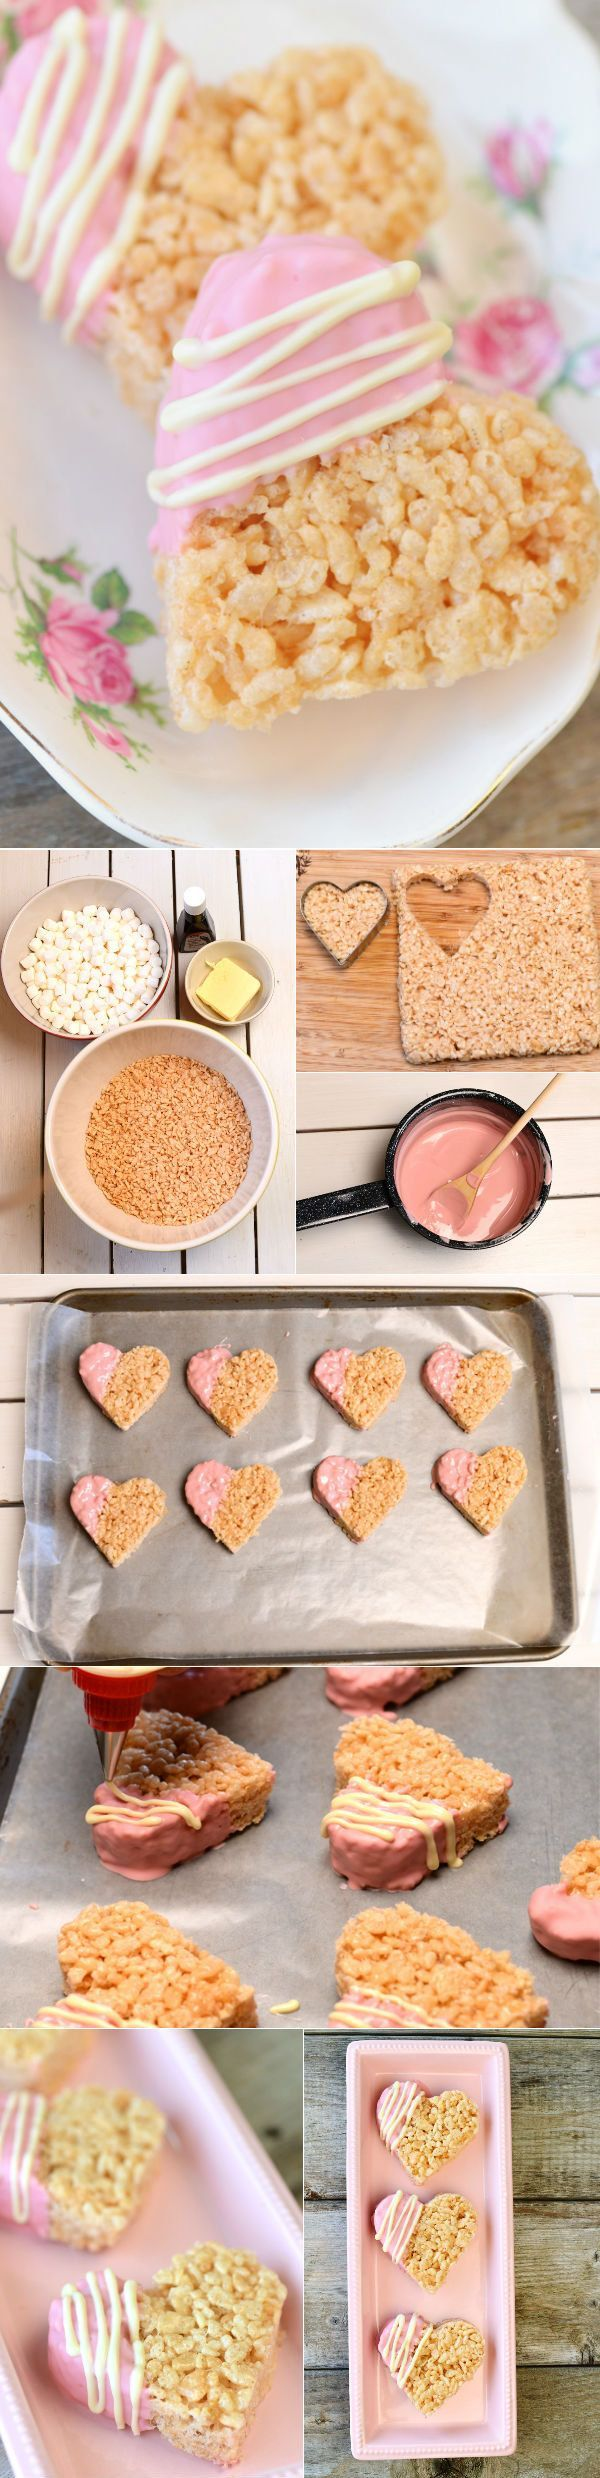 15 budget friendly diy wedding favors pinterest krispie treats cute edible diy wedding favors with rise krispie treat solutioingenieria Image collections